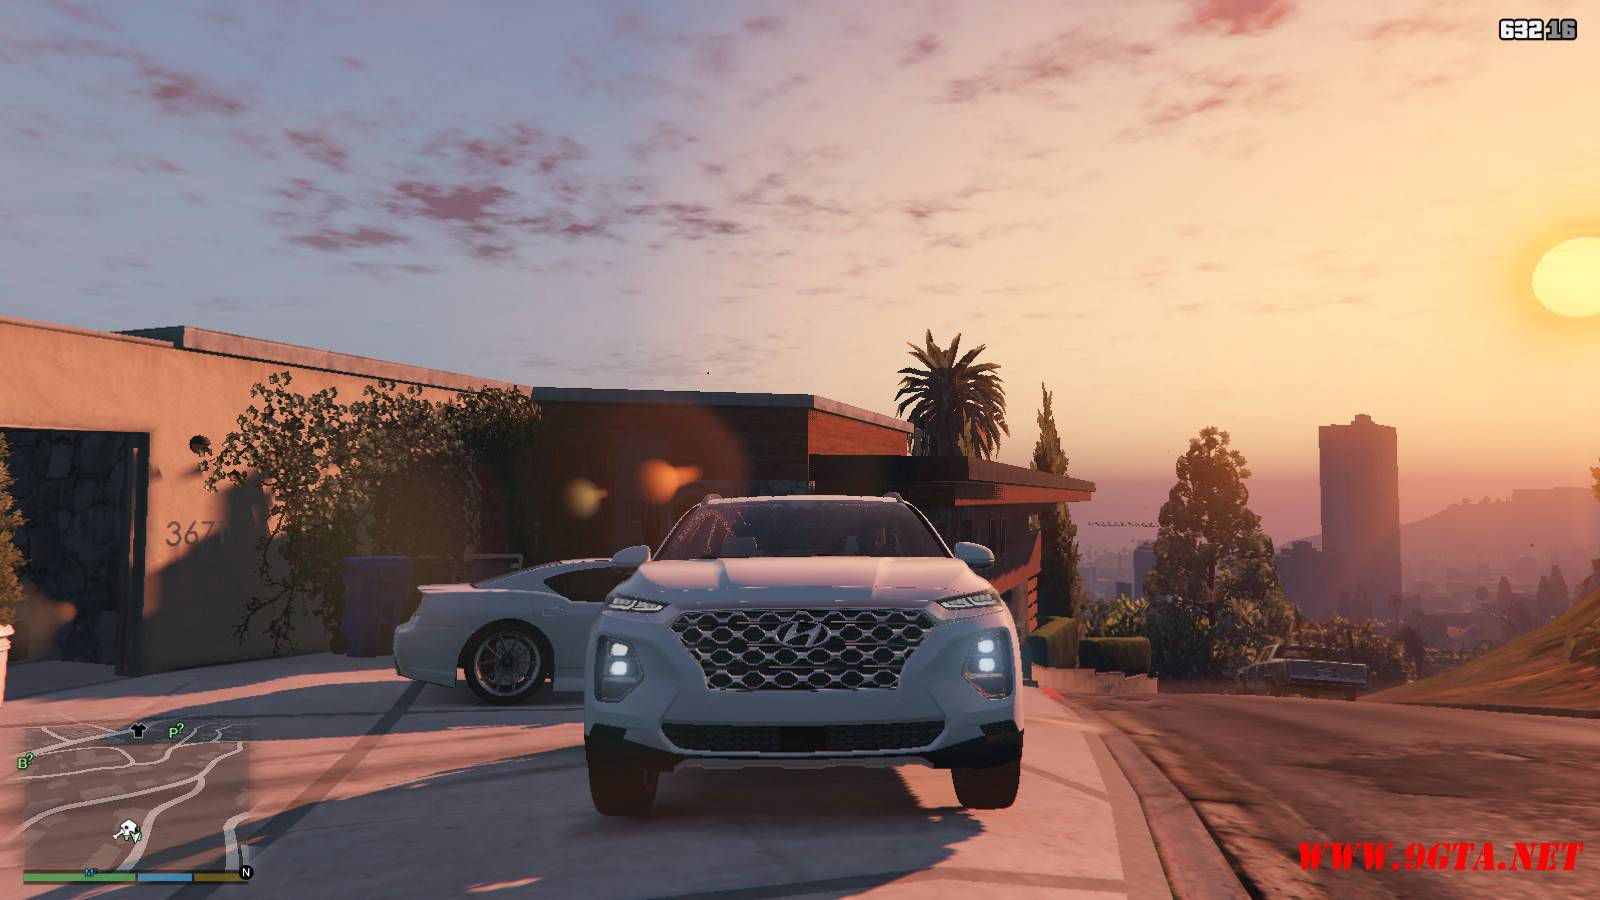 2019 Huyndai Santa Fe GTA5 mods (6)